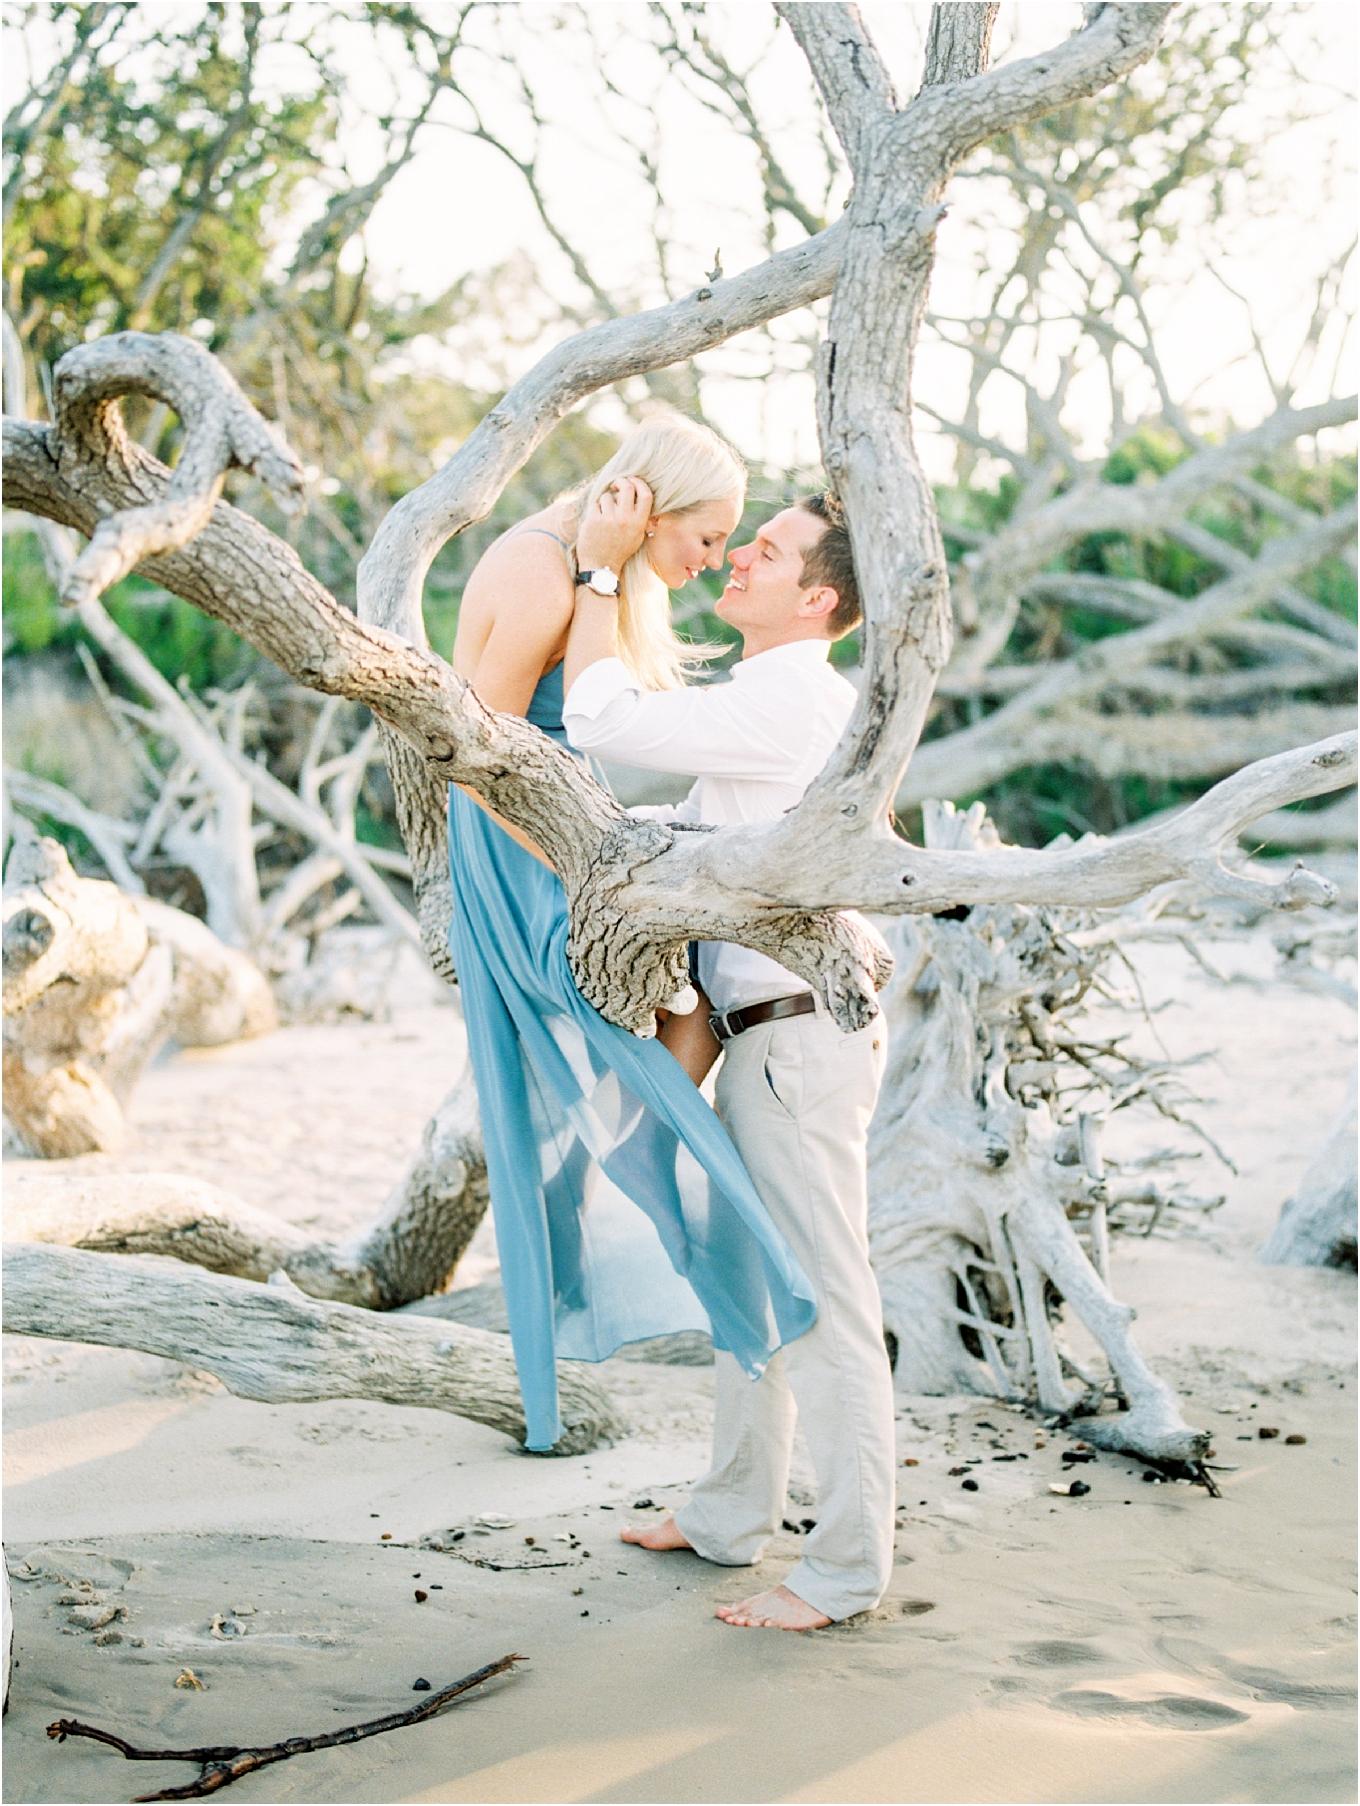 Lisa Silva Photography- Ponte Vedra Beach and Jacksonville, Florida Fine Art Film Wedding Photography- Engagement Shoot at Big Talbot Island_0014.jpg